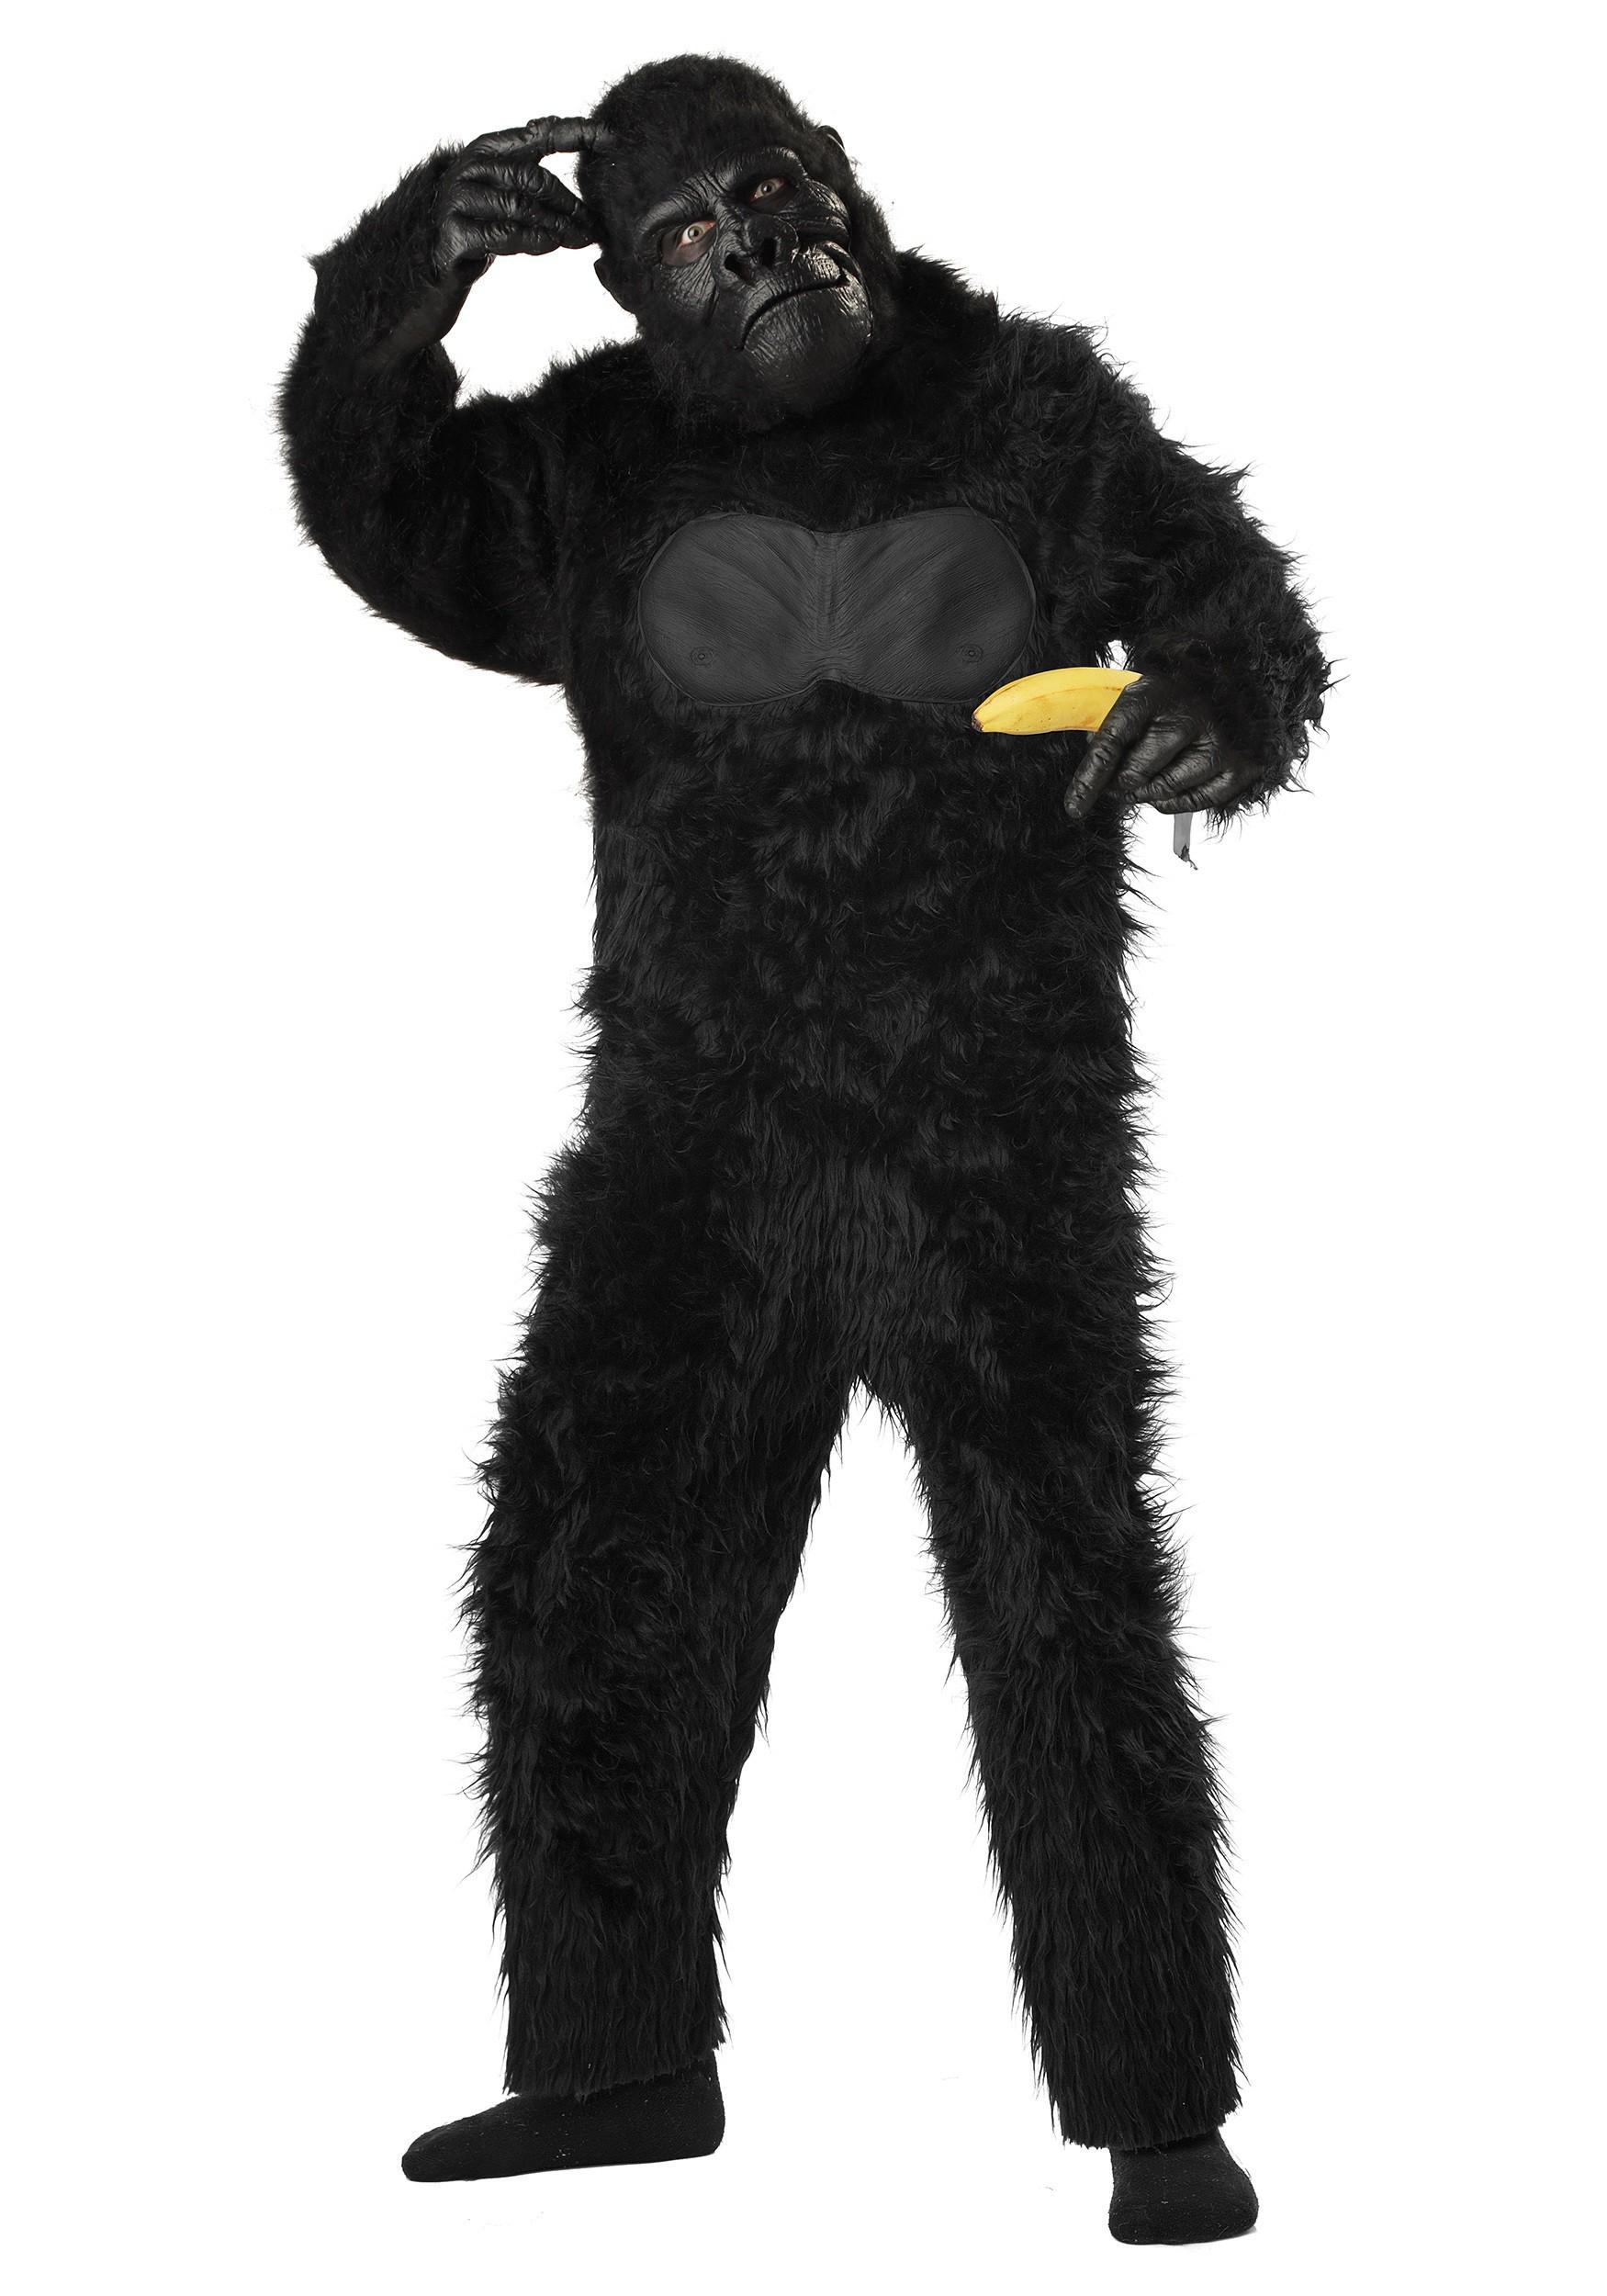 Gorilla For One Child Deluxe Gorilla Costume